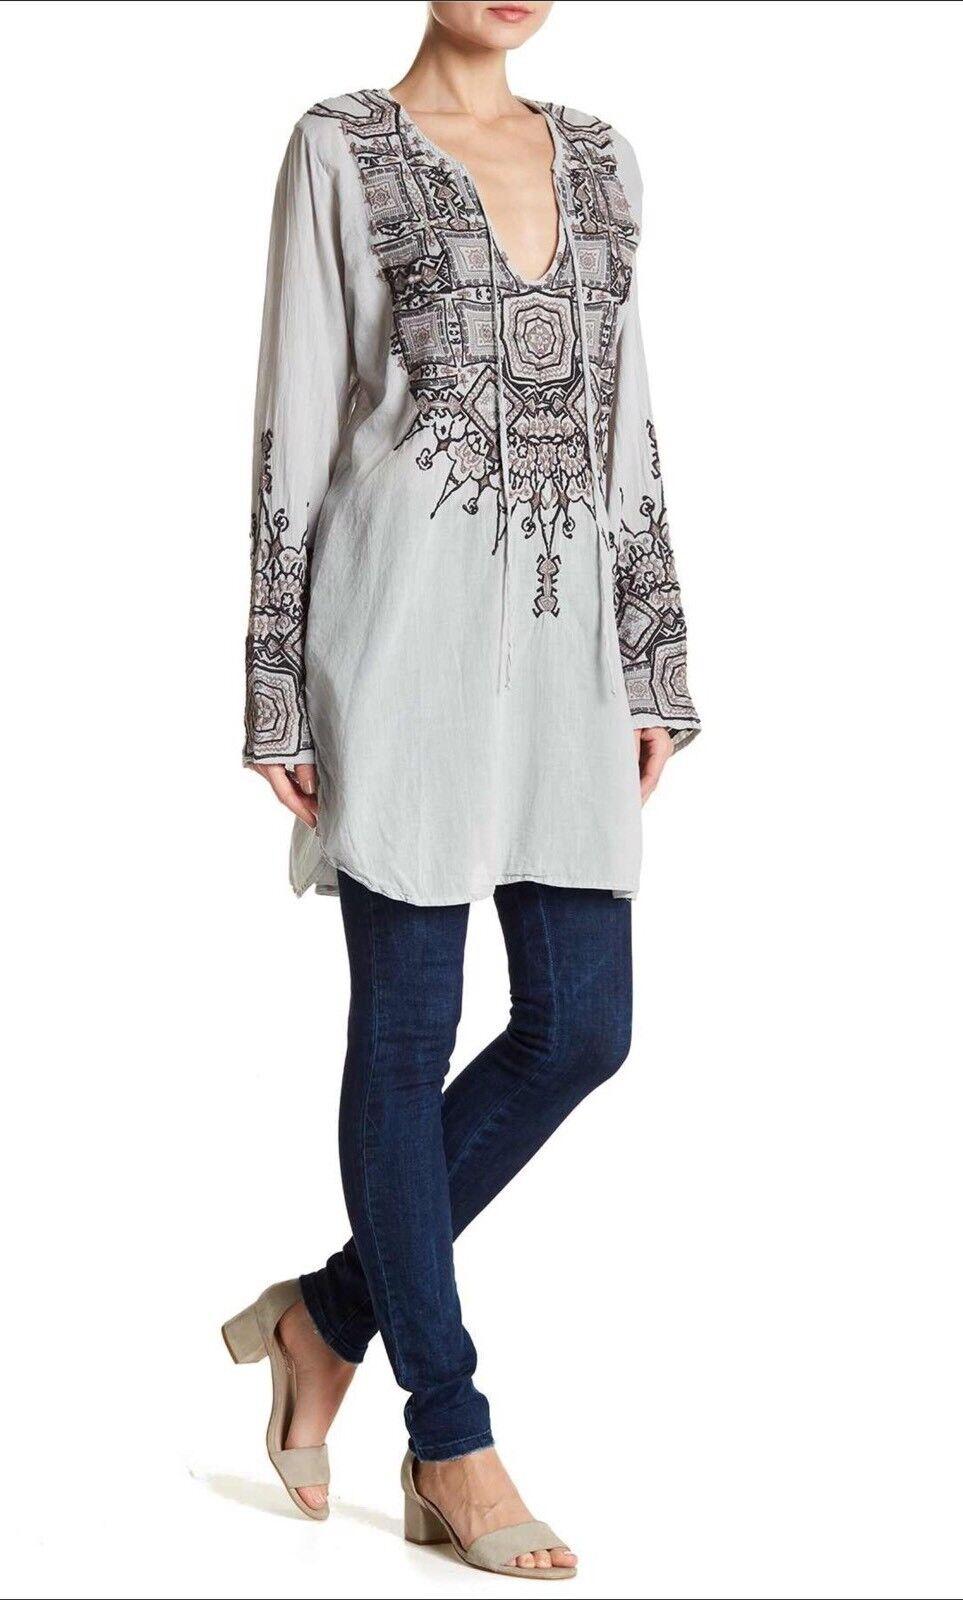 Biya By Johnny Was Biya Mawian Embroidered Tunic Top Blouse L Platinum